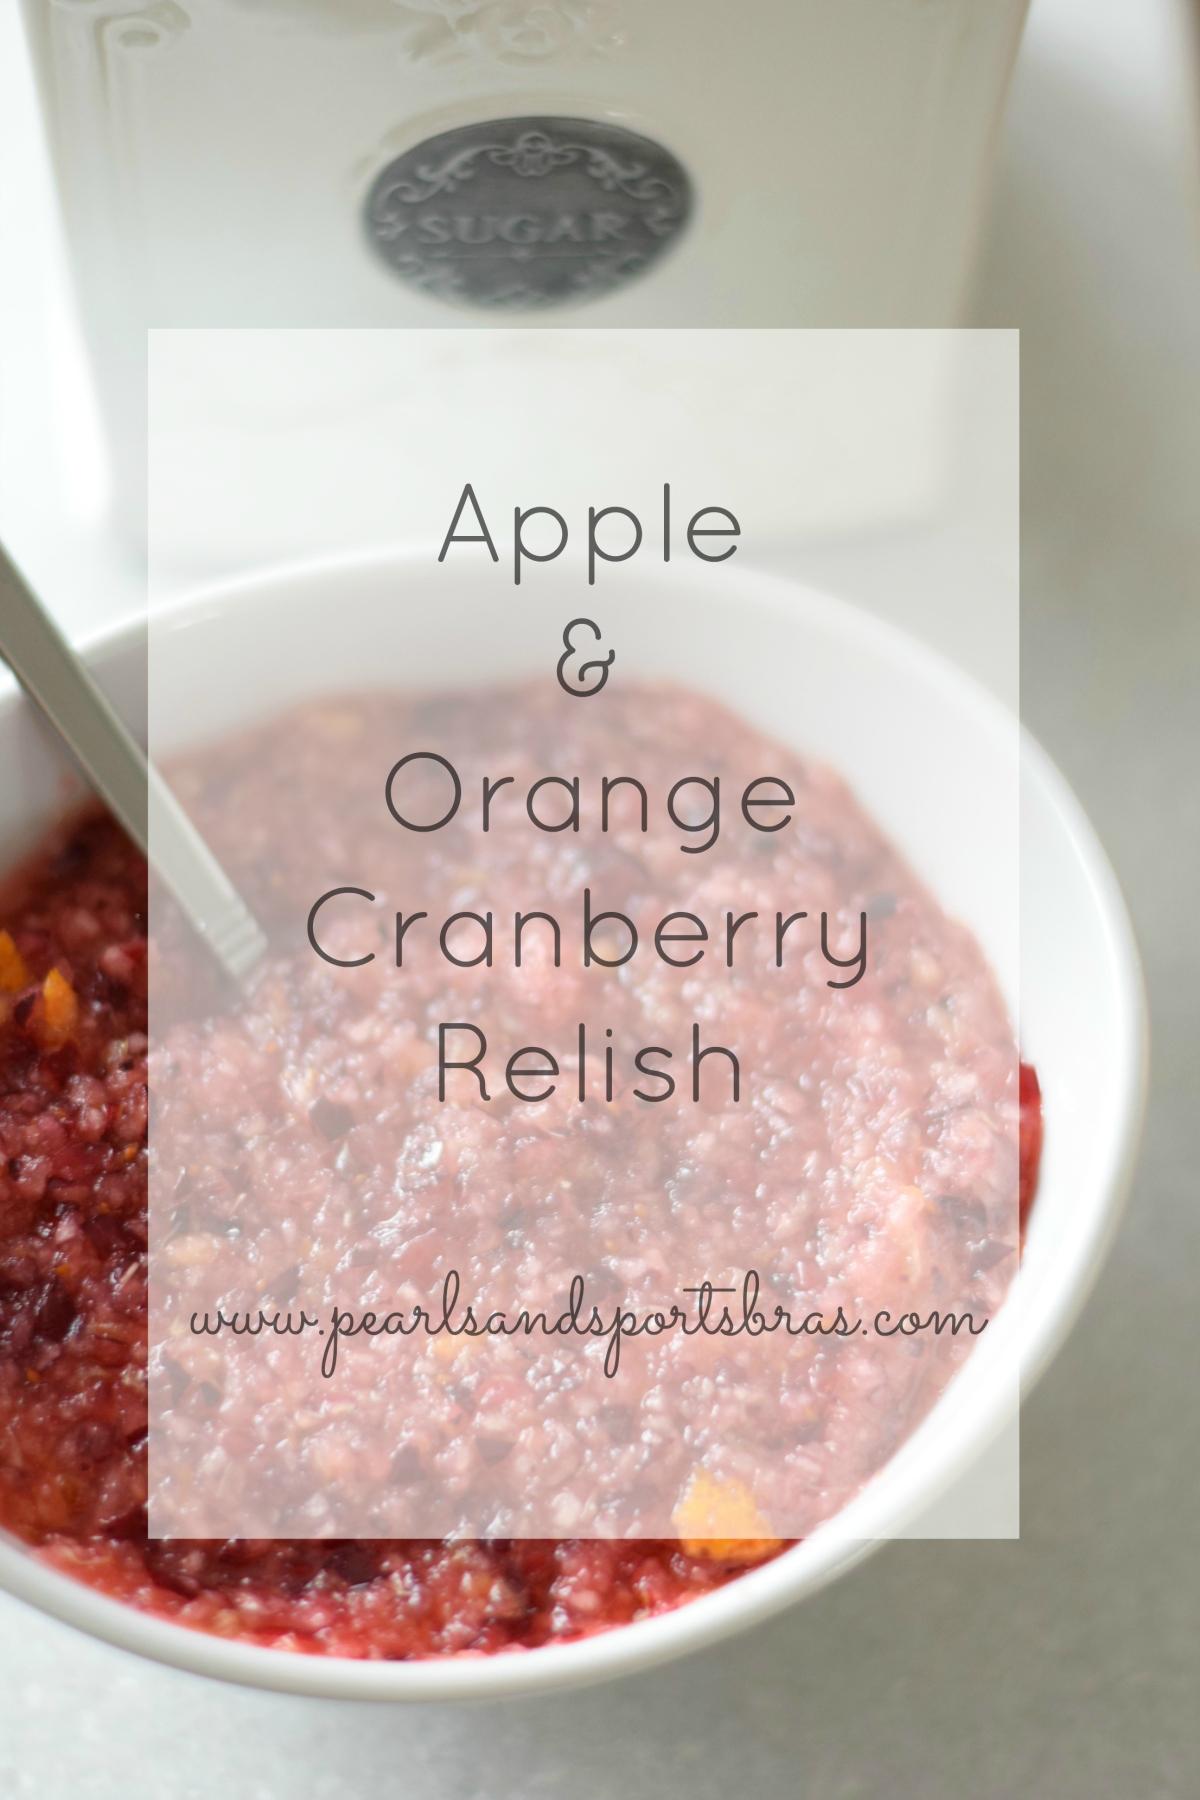 Apple & Orange Cranberry Relish |www,pearlsandsportsbras.com|